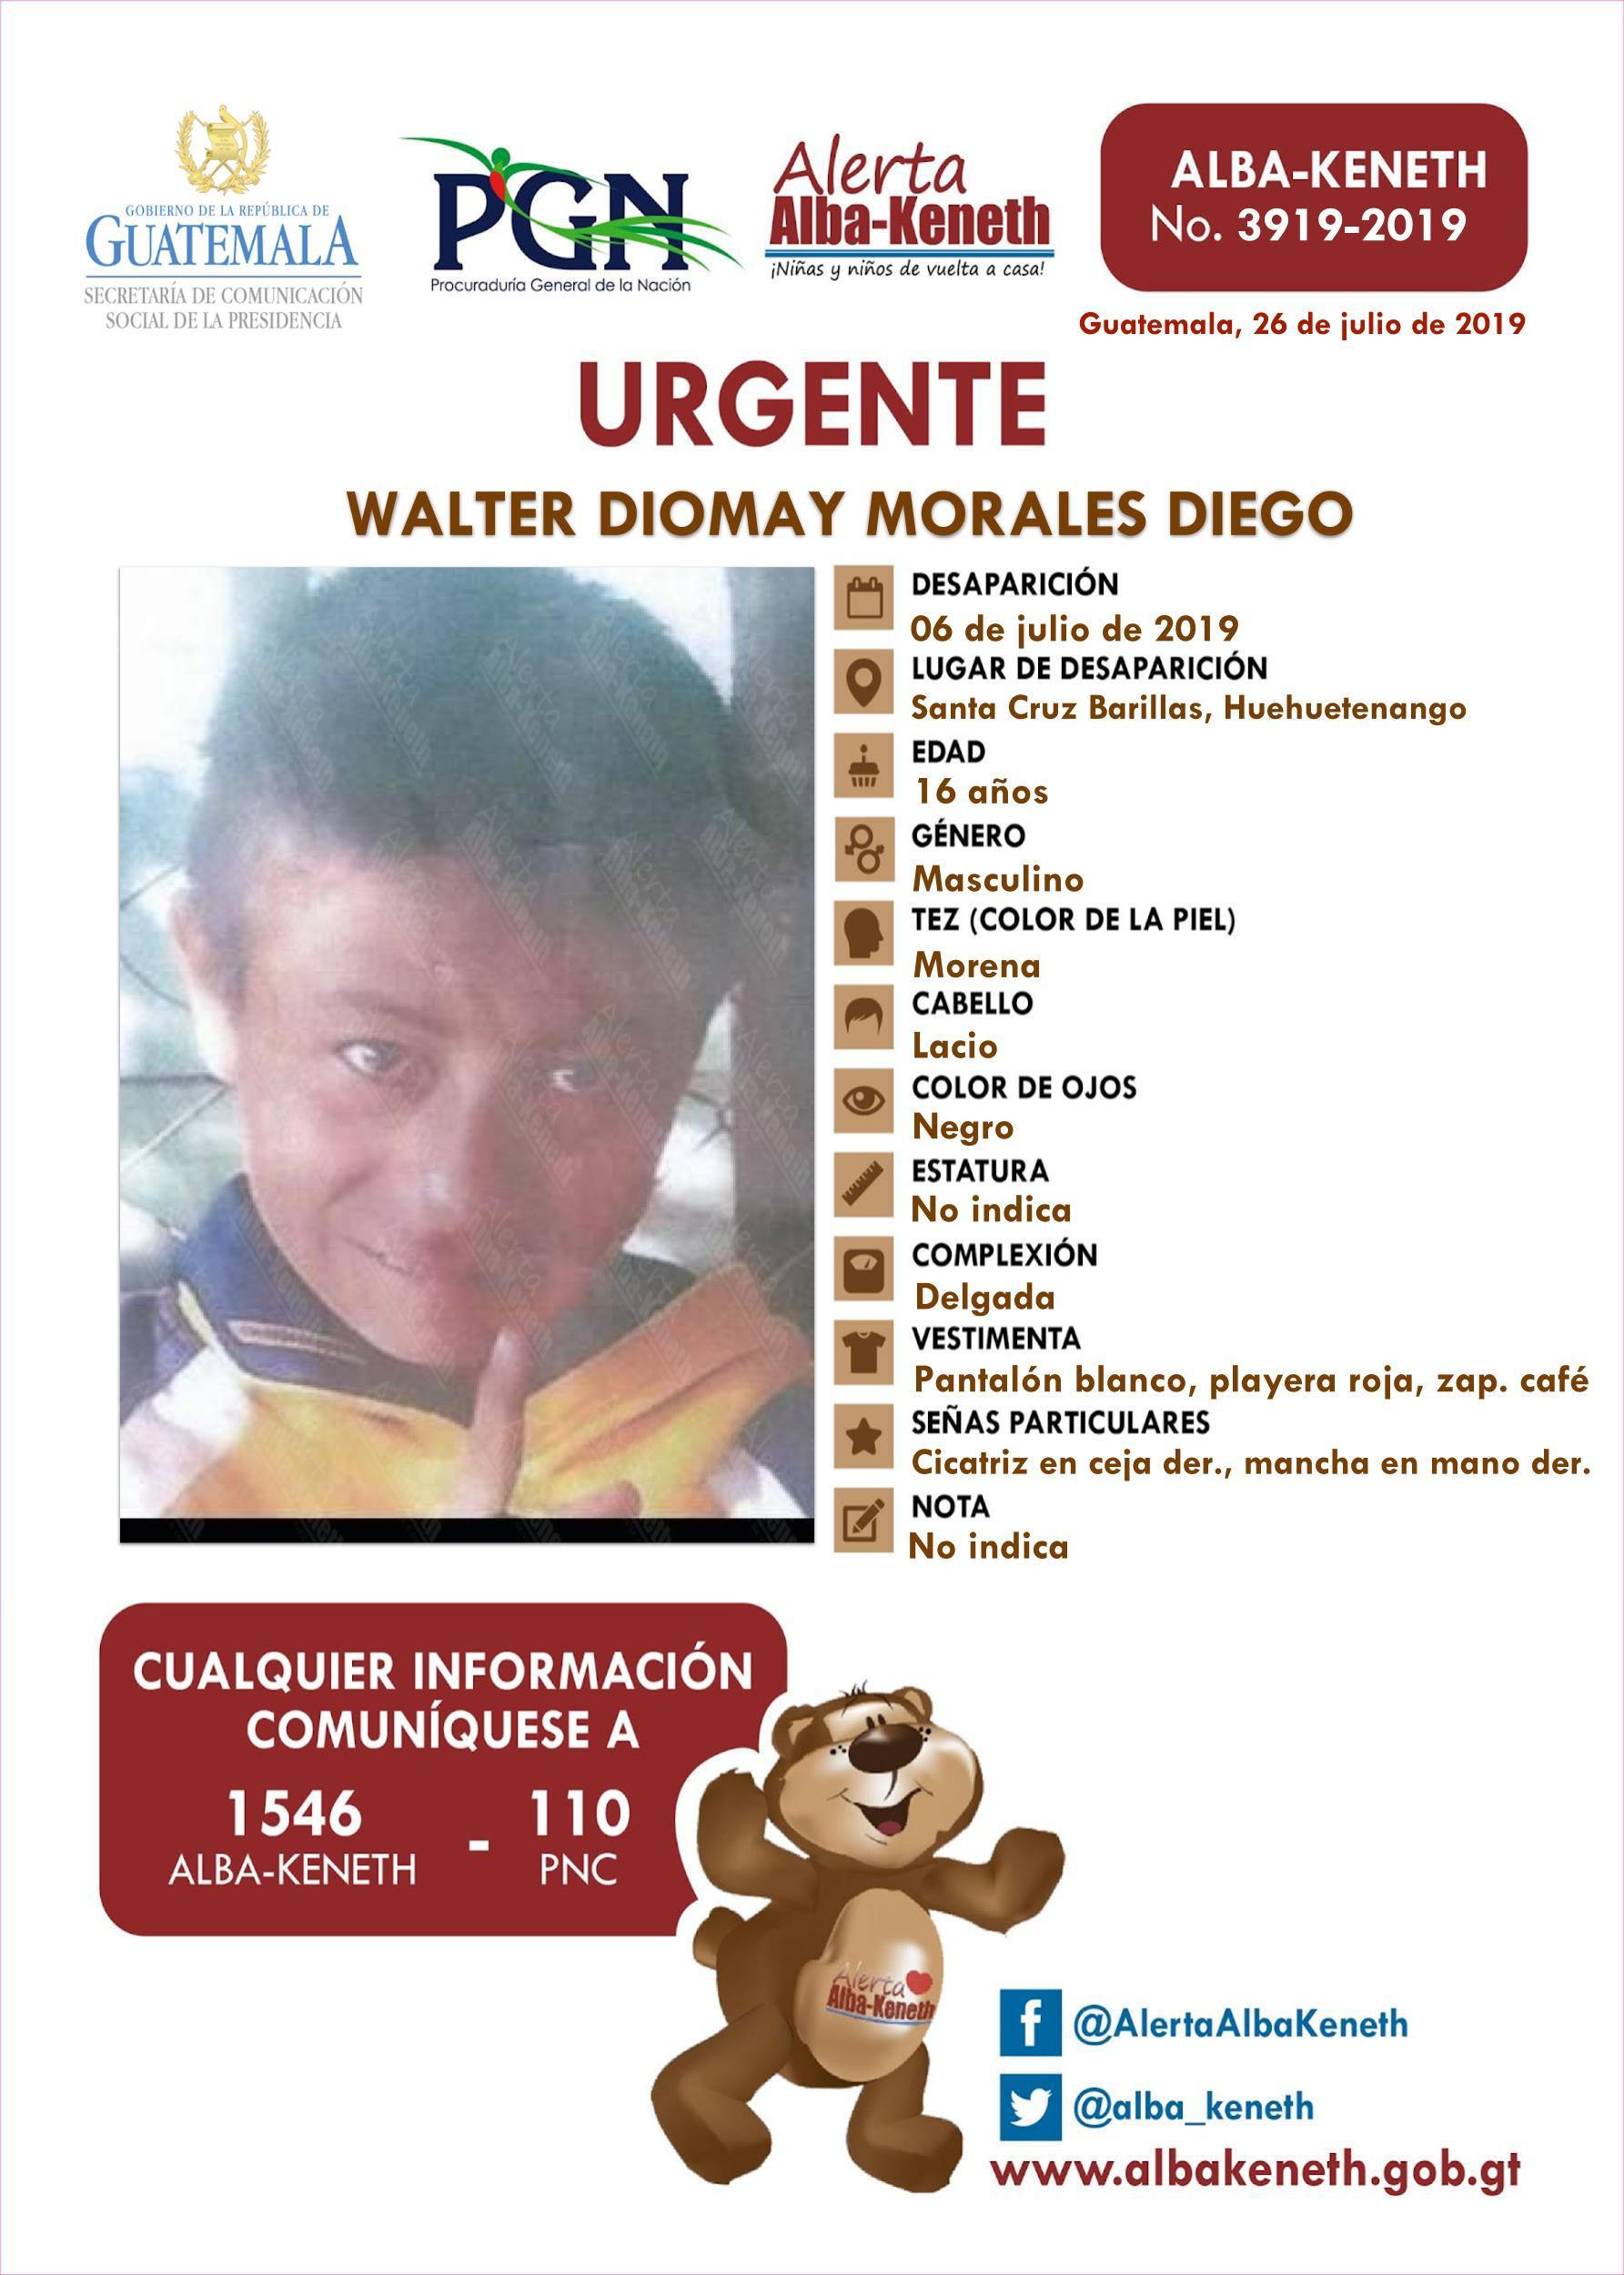 Walter Diomay Morales Diego